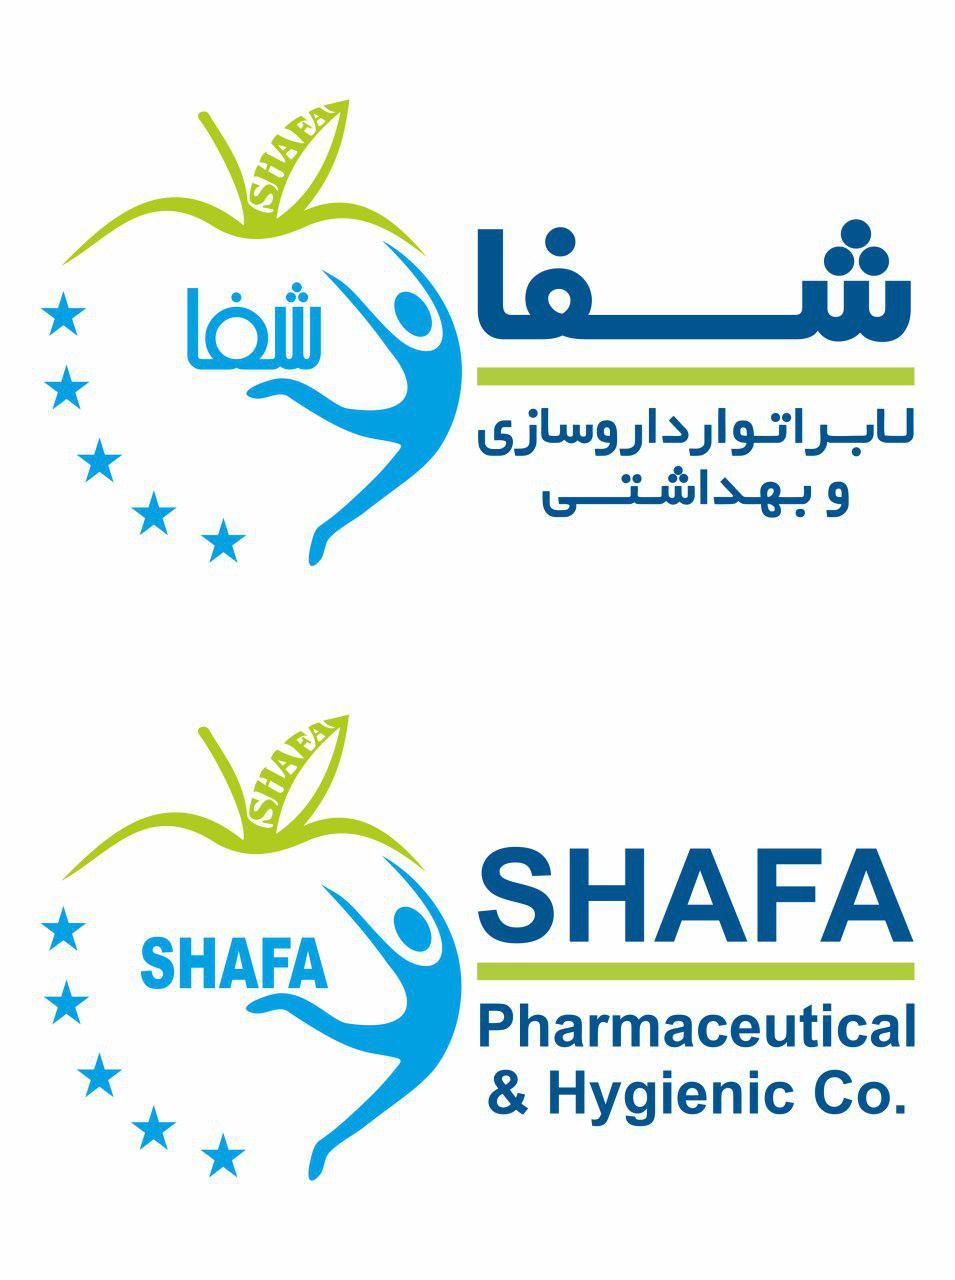 SHAFA Pharmaceutical and Higienic Company